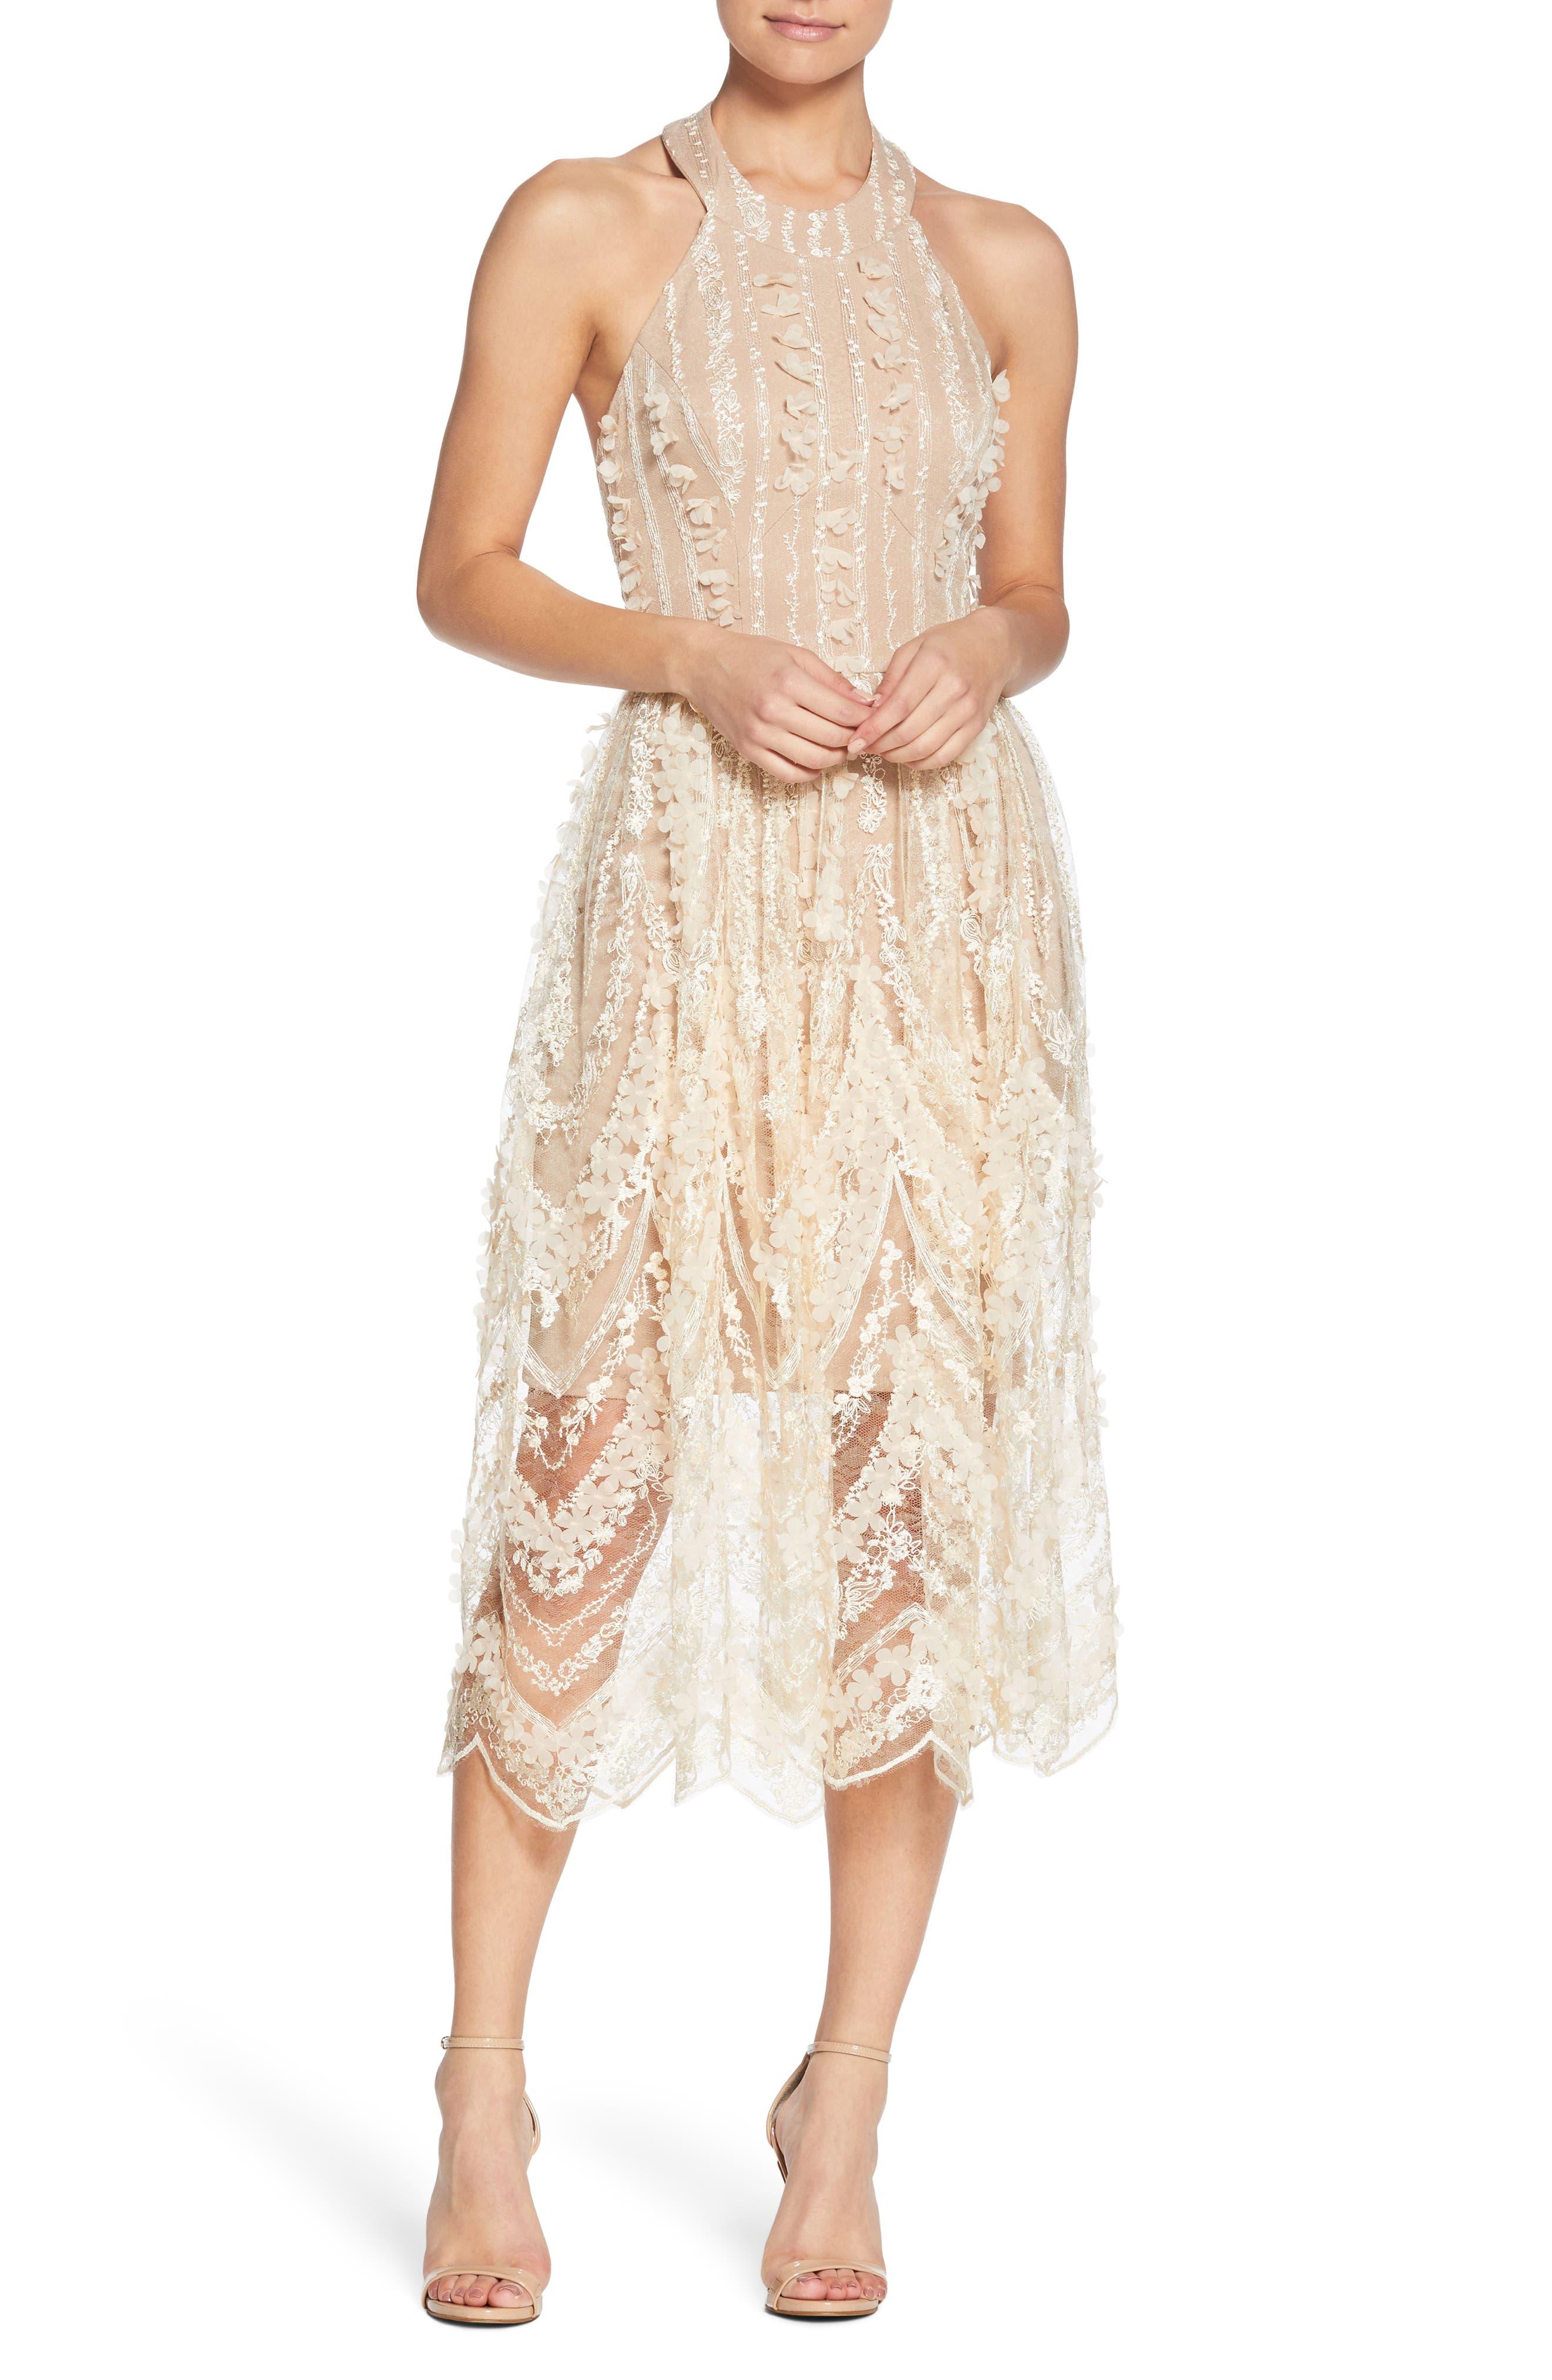 Valerie Halter Dress, Cream/ Nude